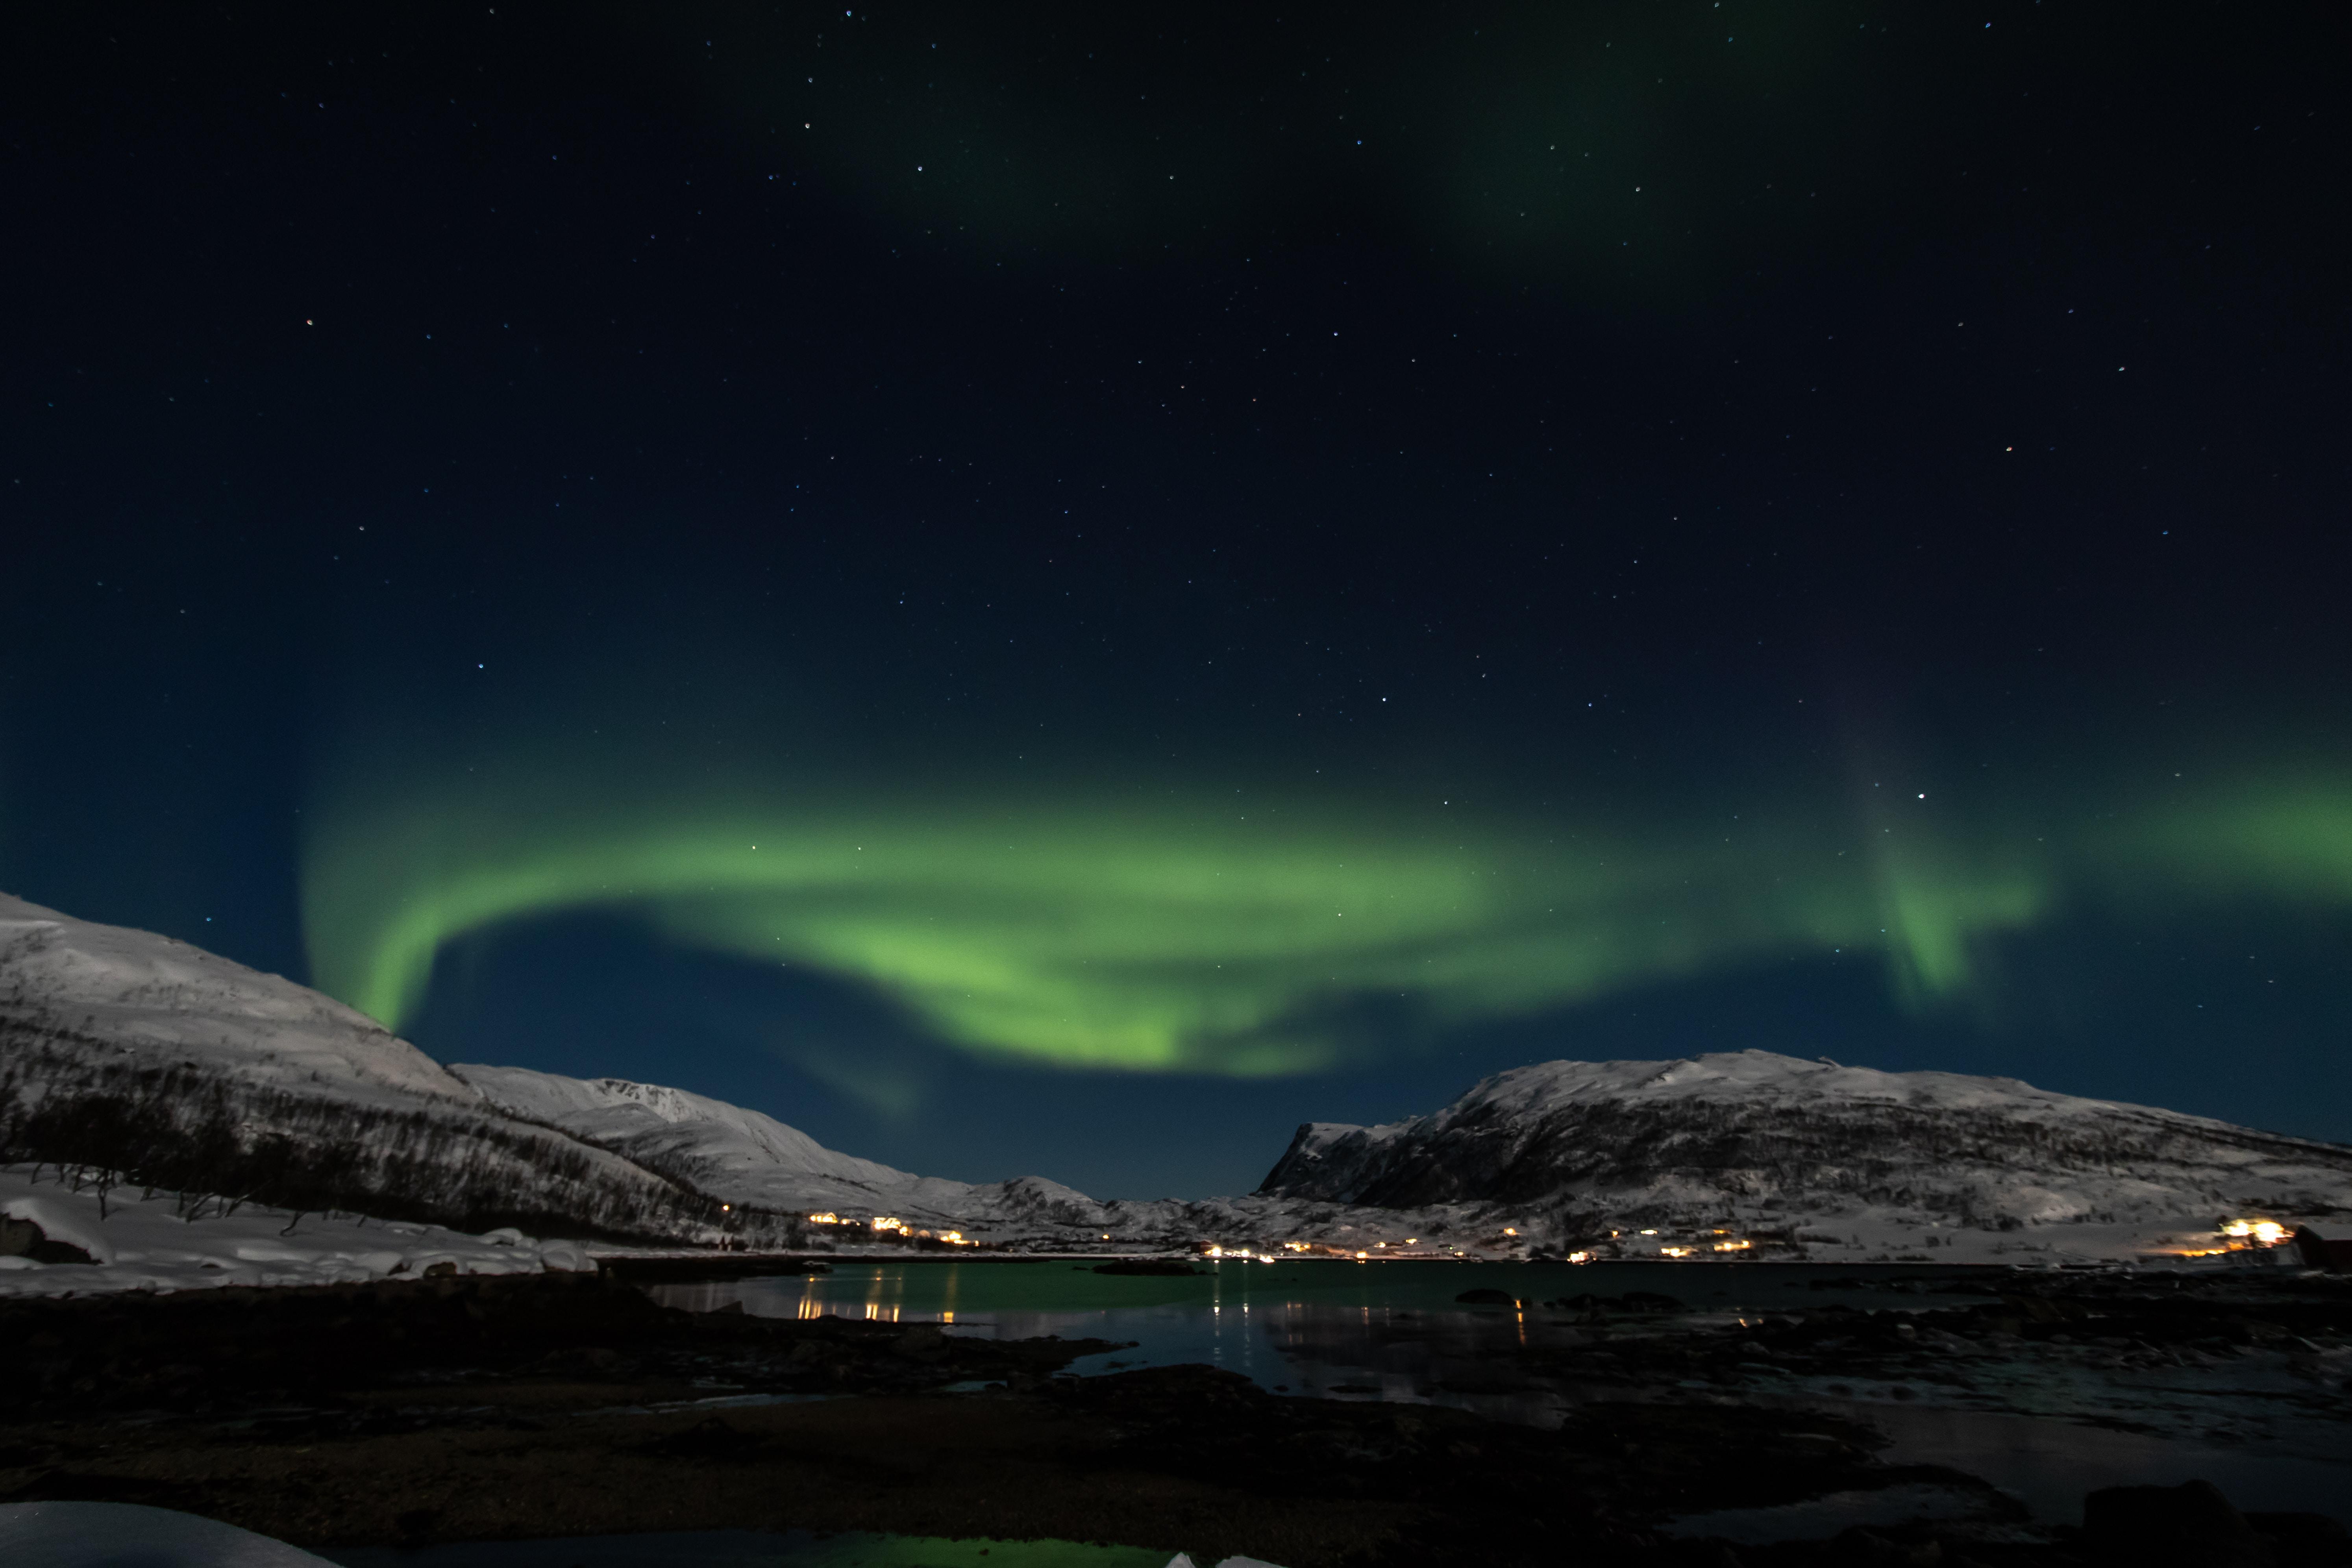 aurora borealis above mountain and body of water